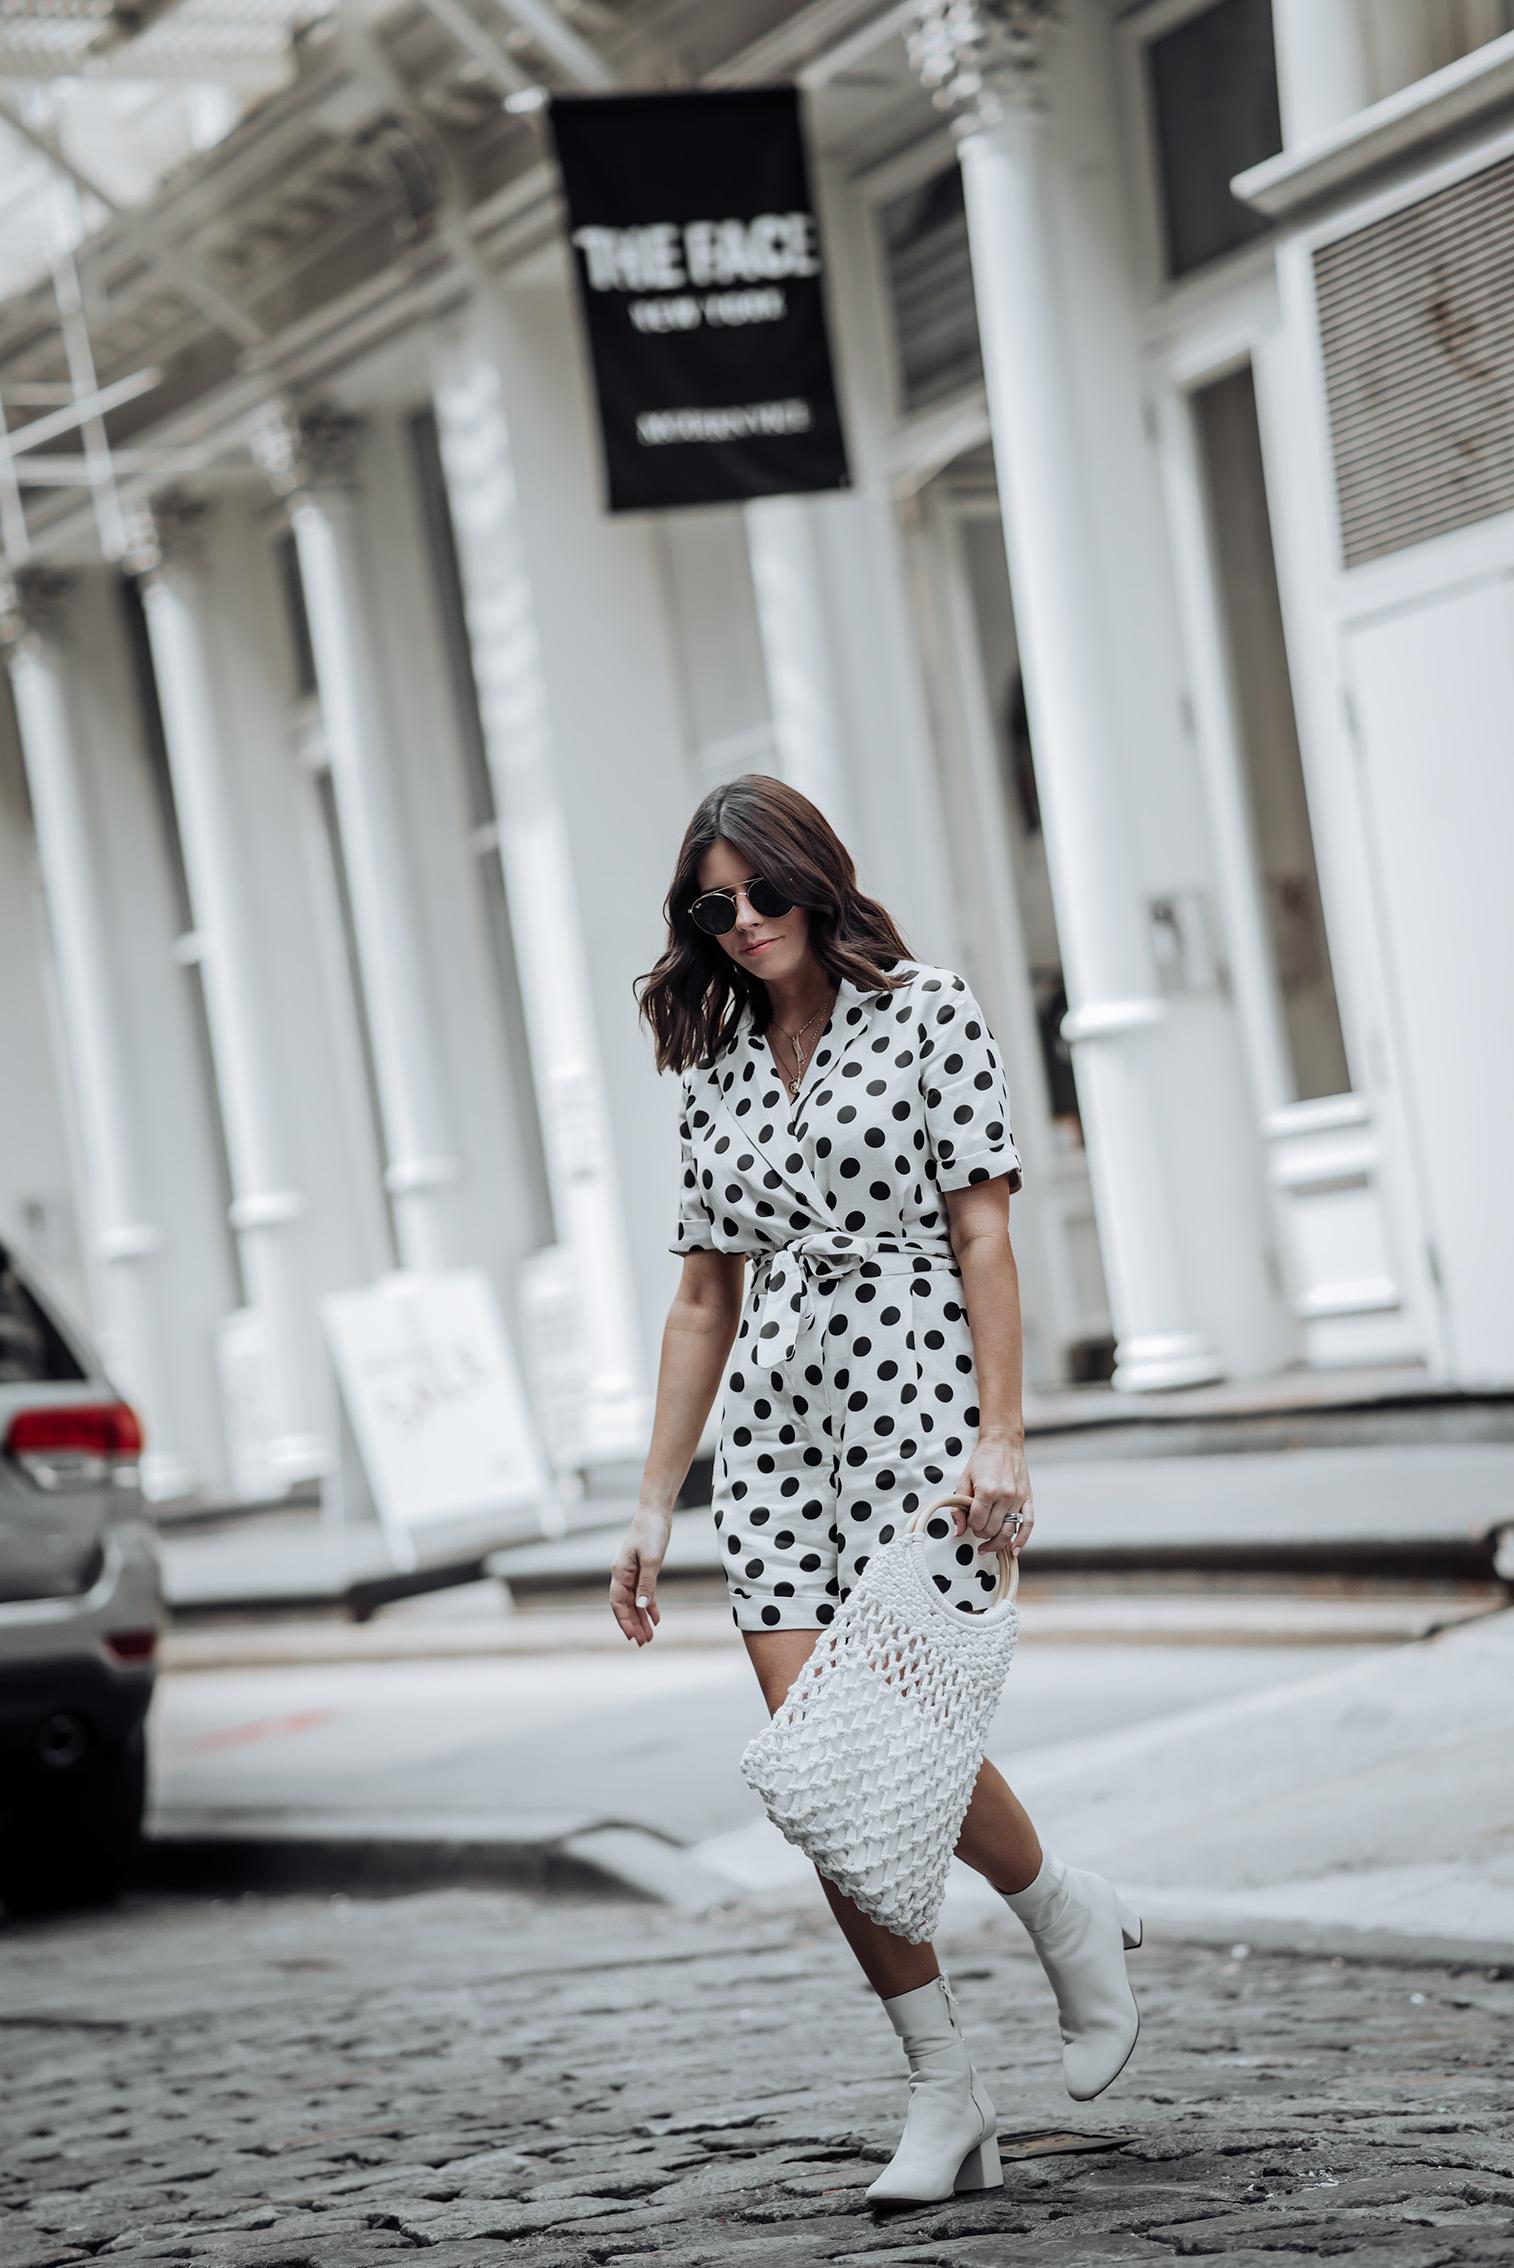 Polka Dot Romer via TOPSHOP | Ankle Boots | Handbang |#topshopstyle #streetstyle #polkadotoutfits